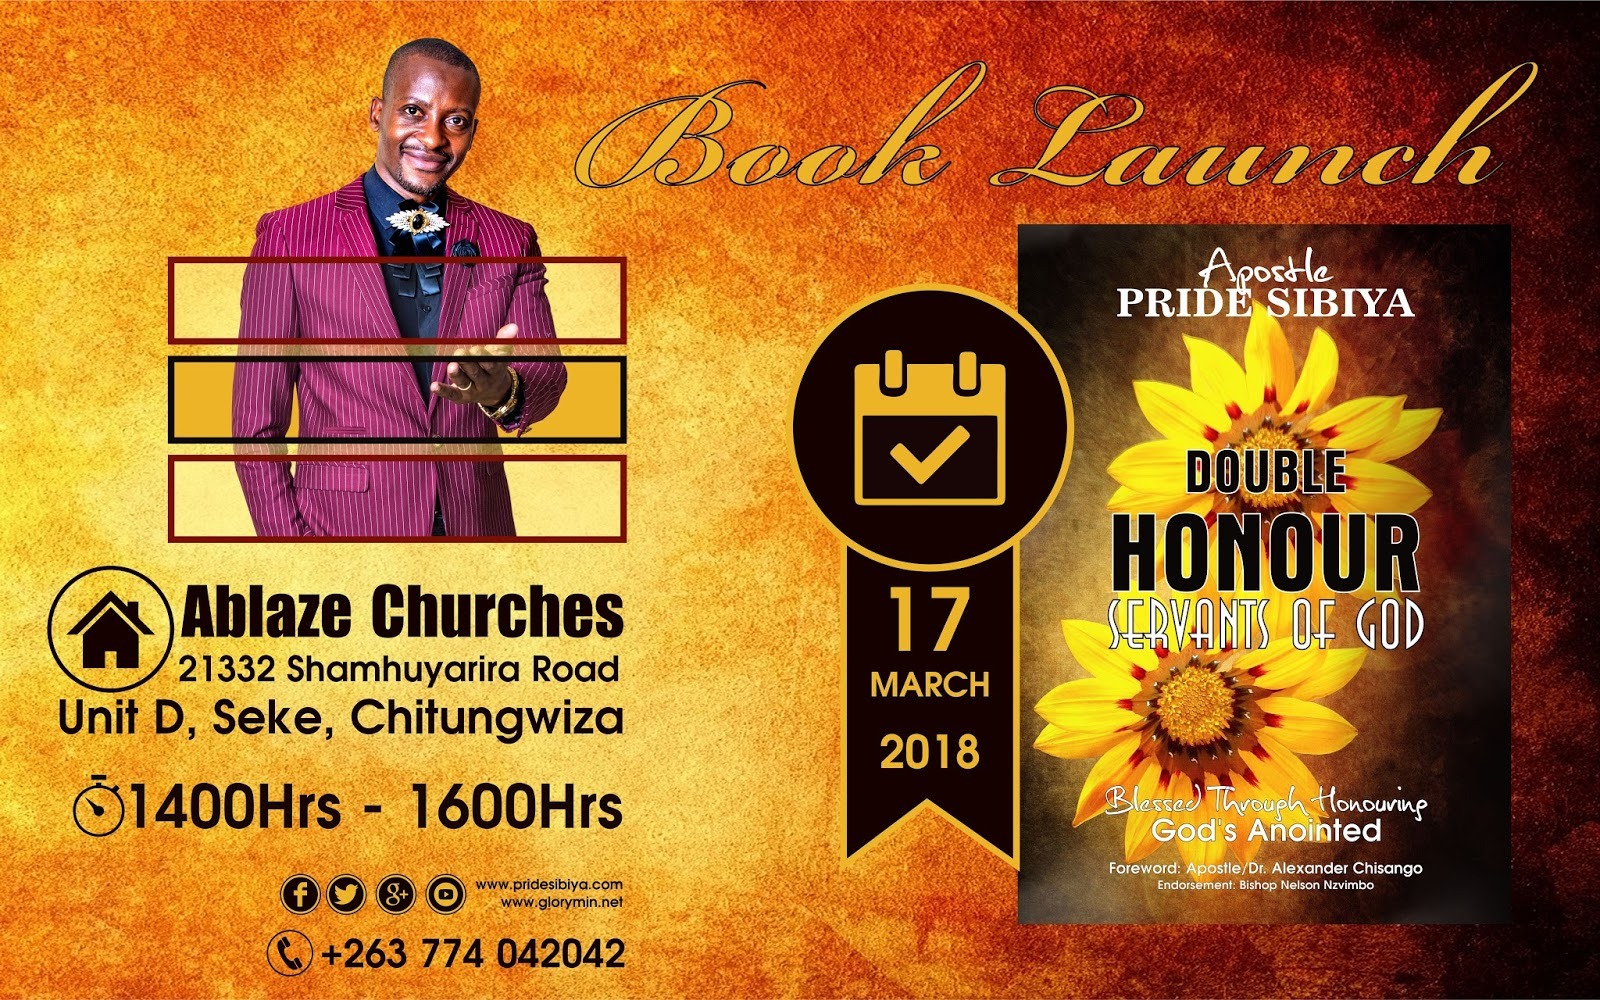 Double Honour Servants of God By Apostle P. Sibiya